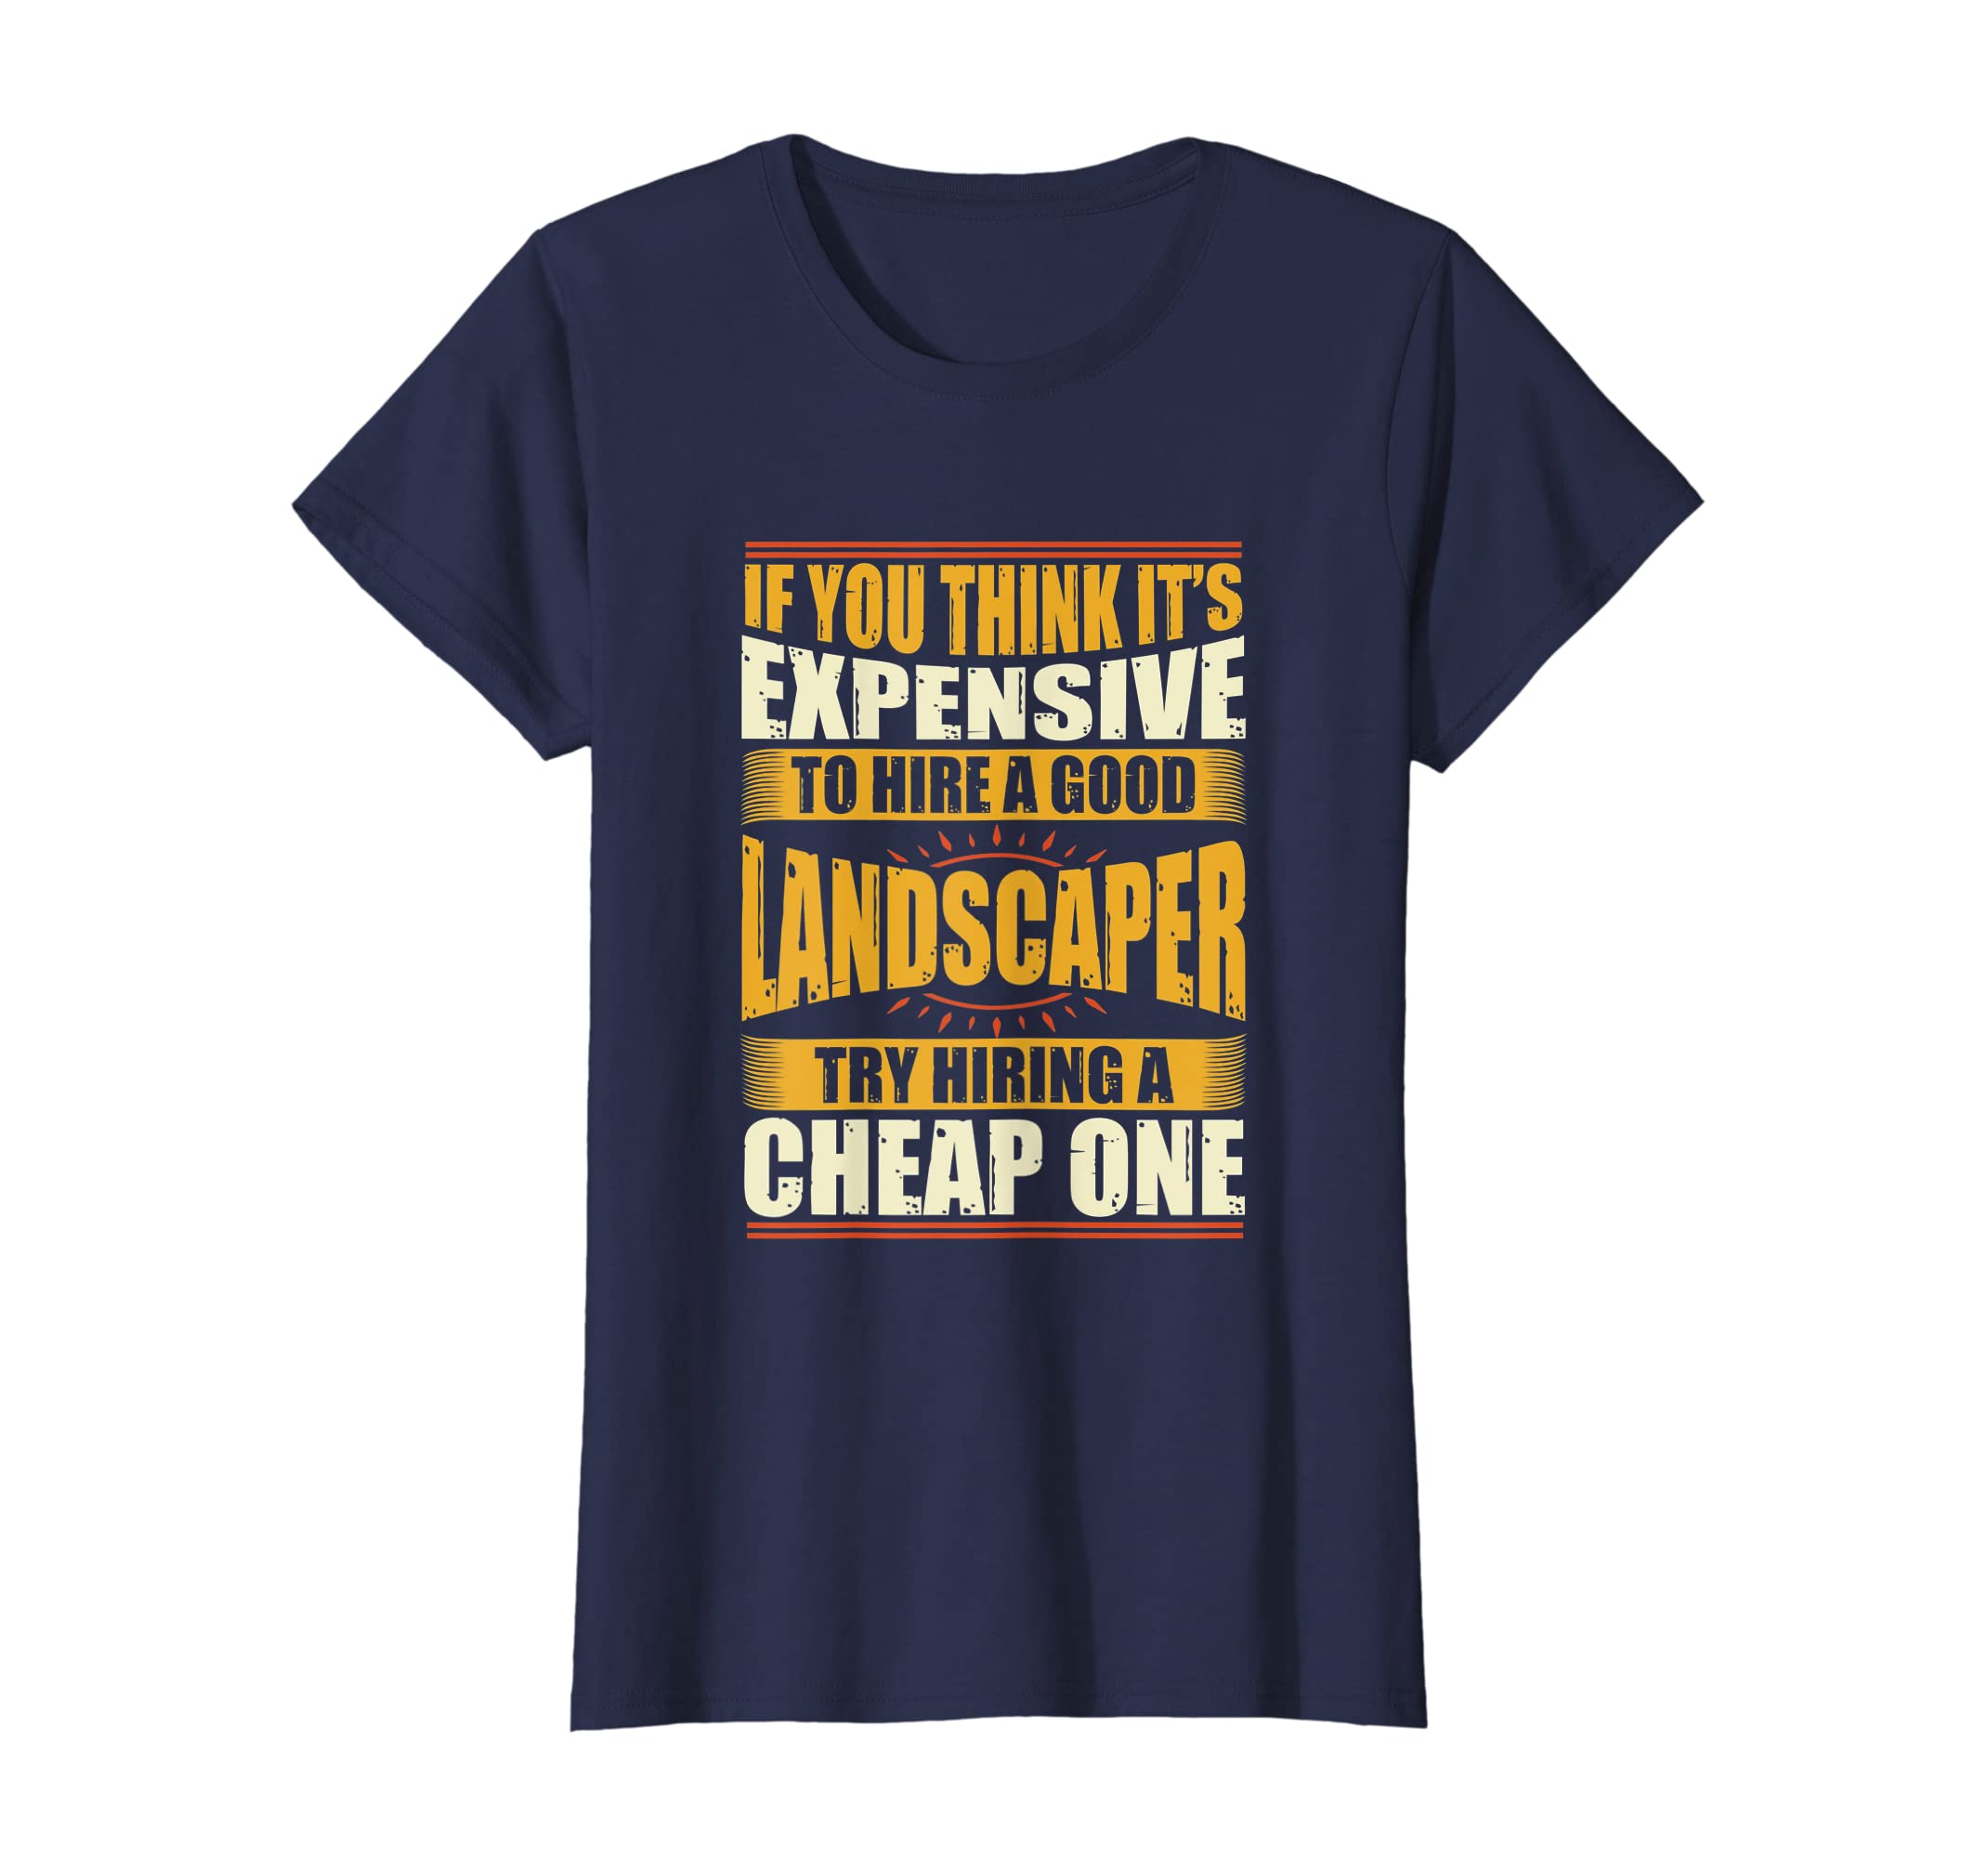 e6fd0d4c3 Amazon.com: Mens Womens Funny Landscaper Shirts Landscaping Shirt c50:  Clothing